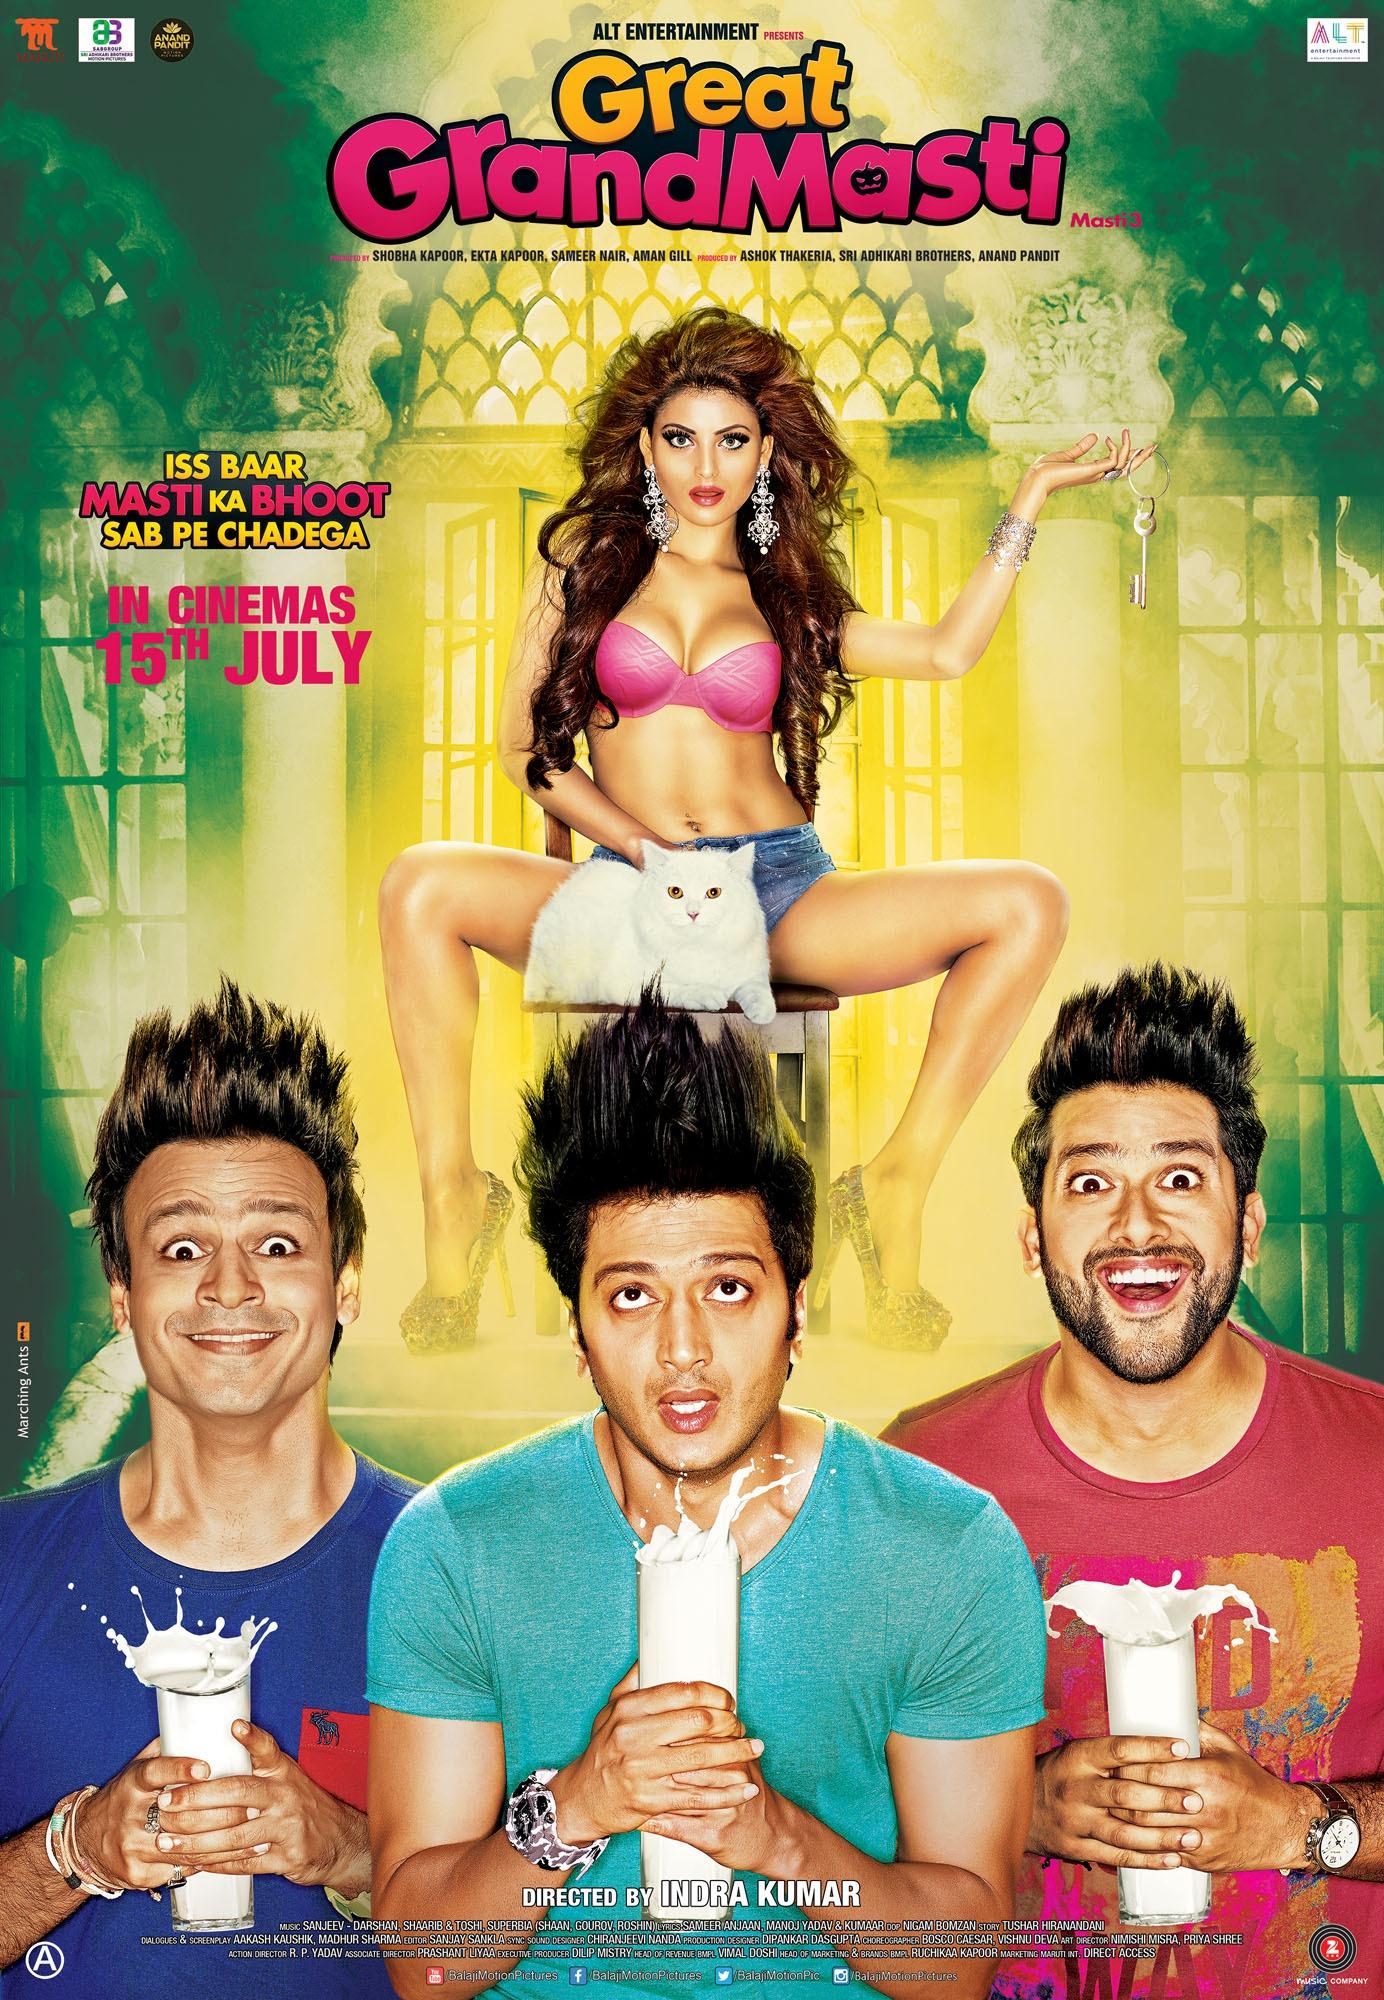 Great Grand Masti (2016) Hindi Full Movie